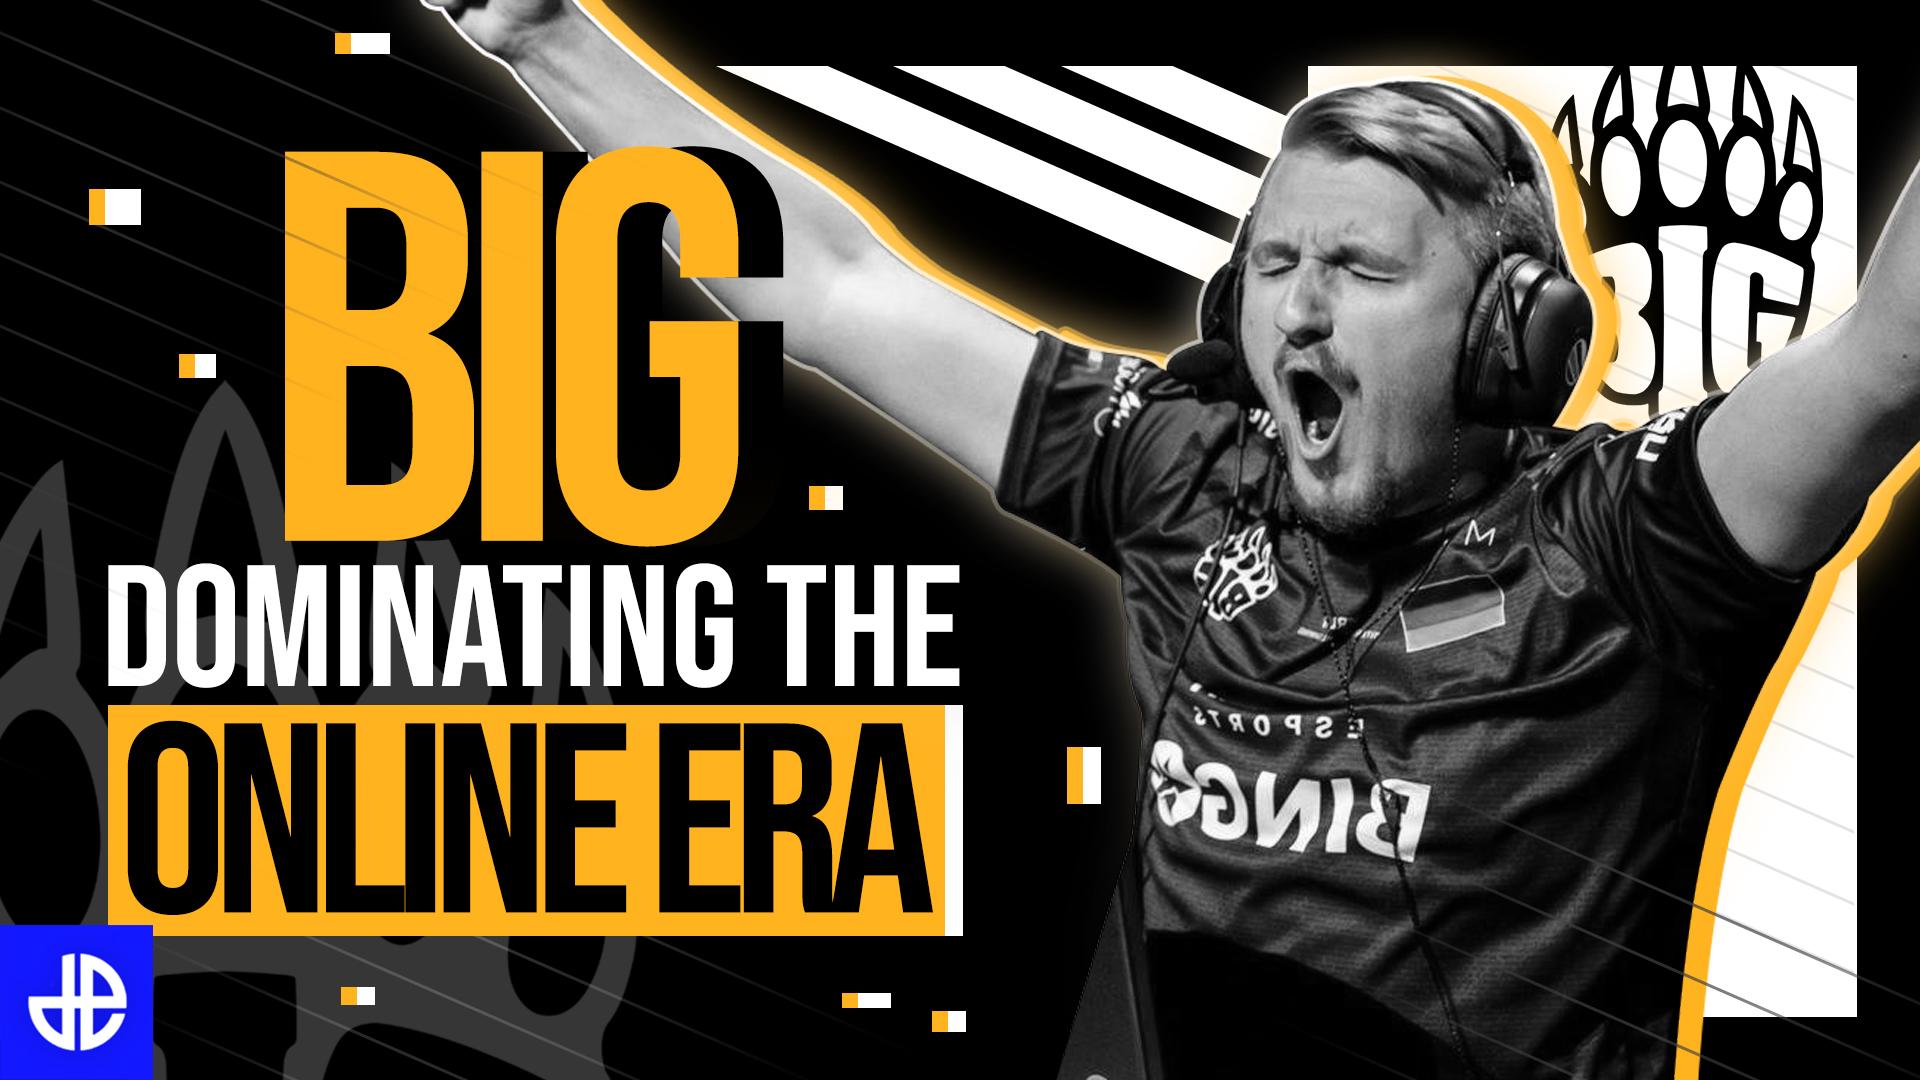 BIG Dominate the online era